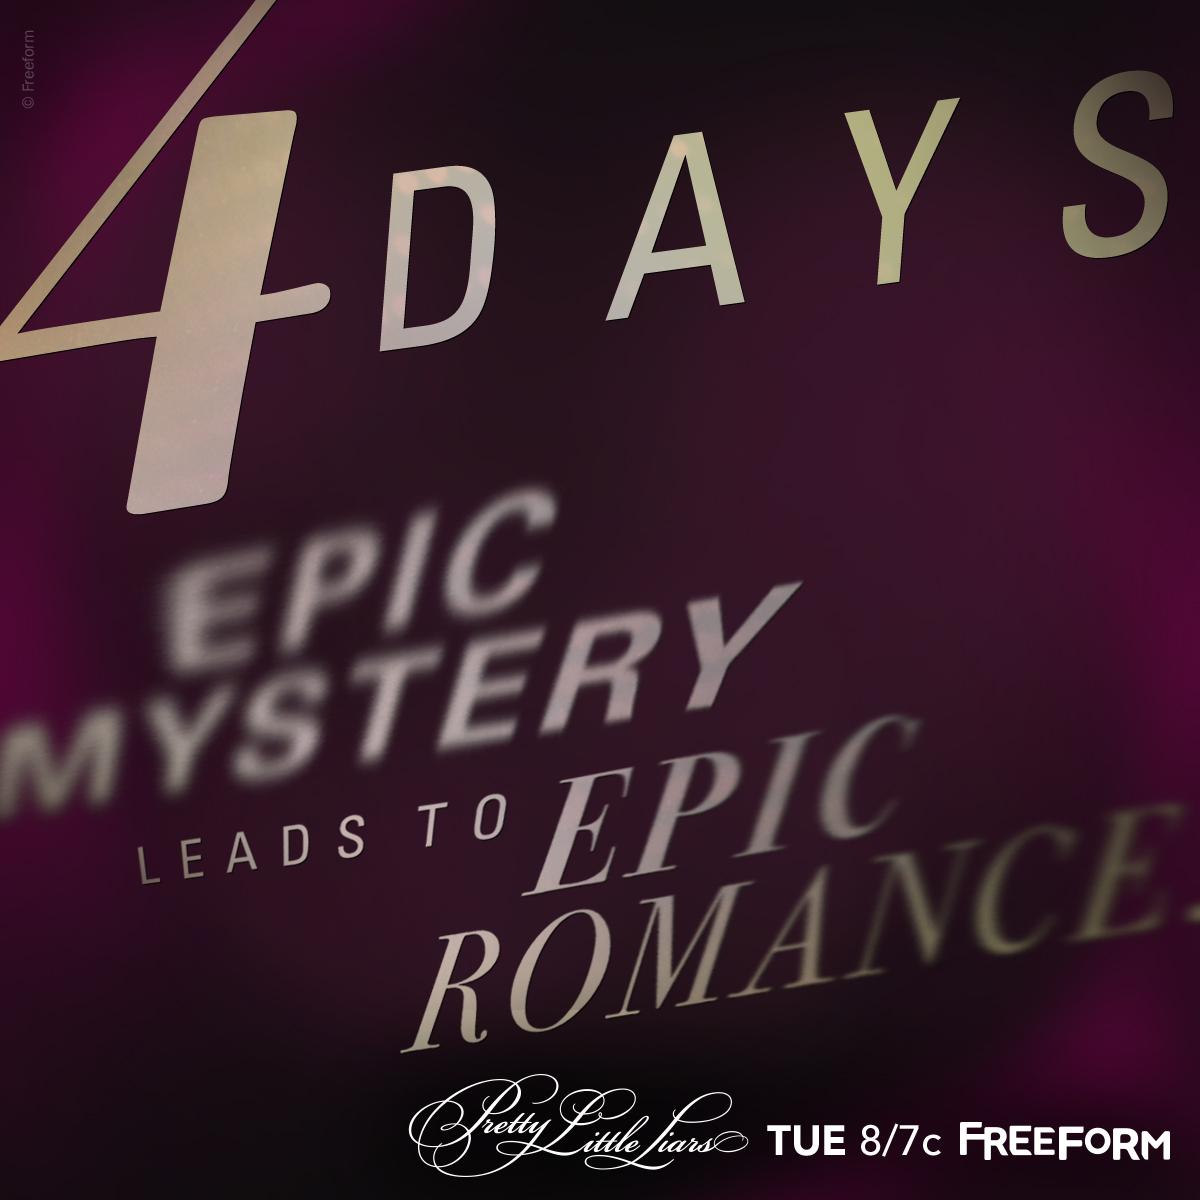 Pretty Little Liars - Here's What We Know Will Happen In The Pretty Little Liars Season 6 Finale! - 1005